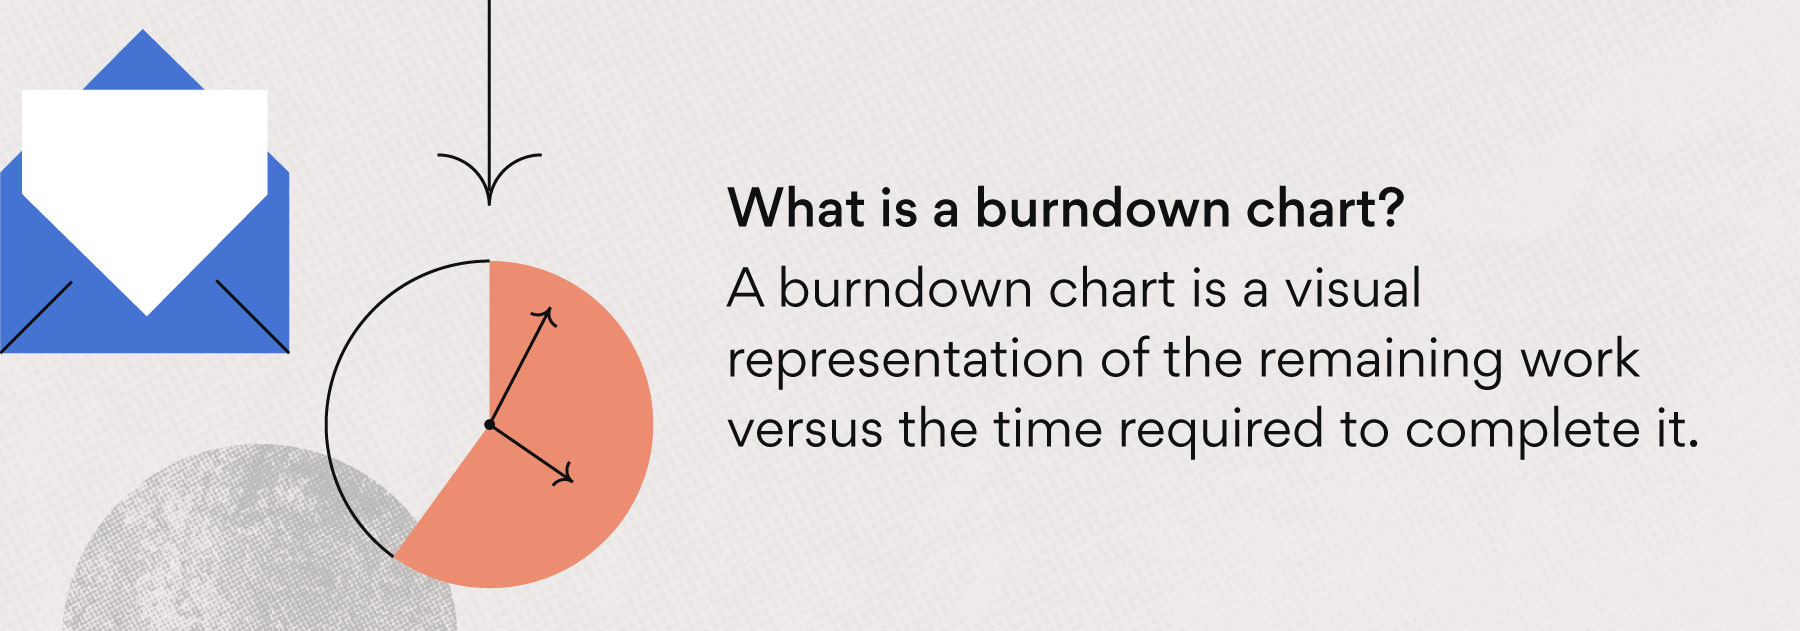 what is a burndown chart